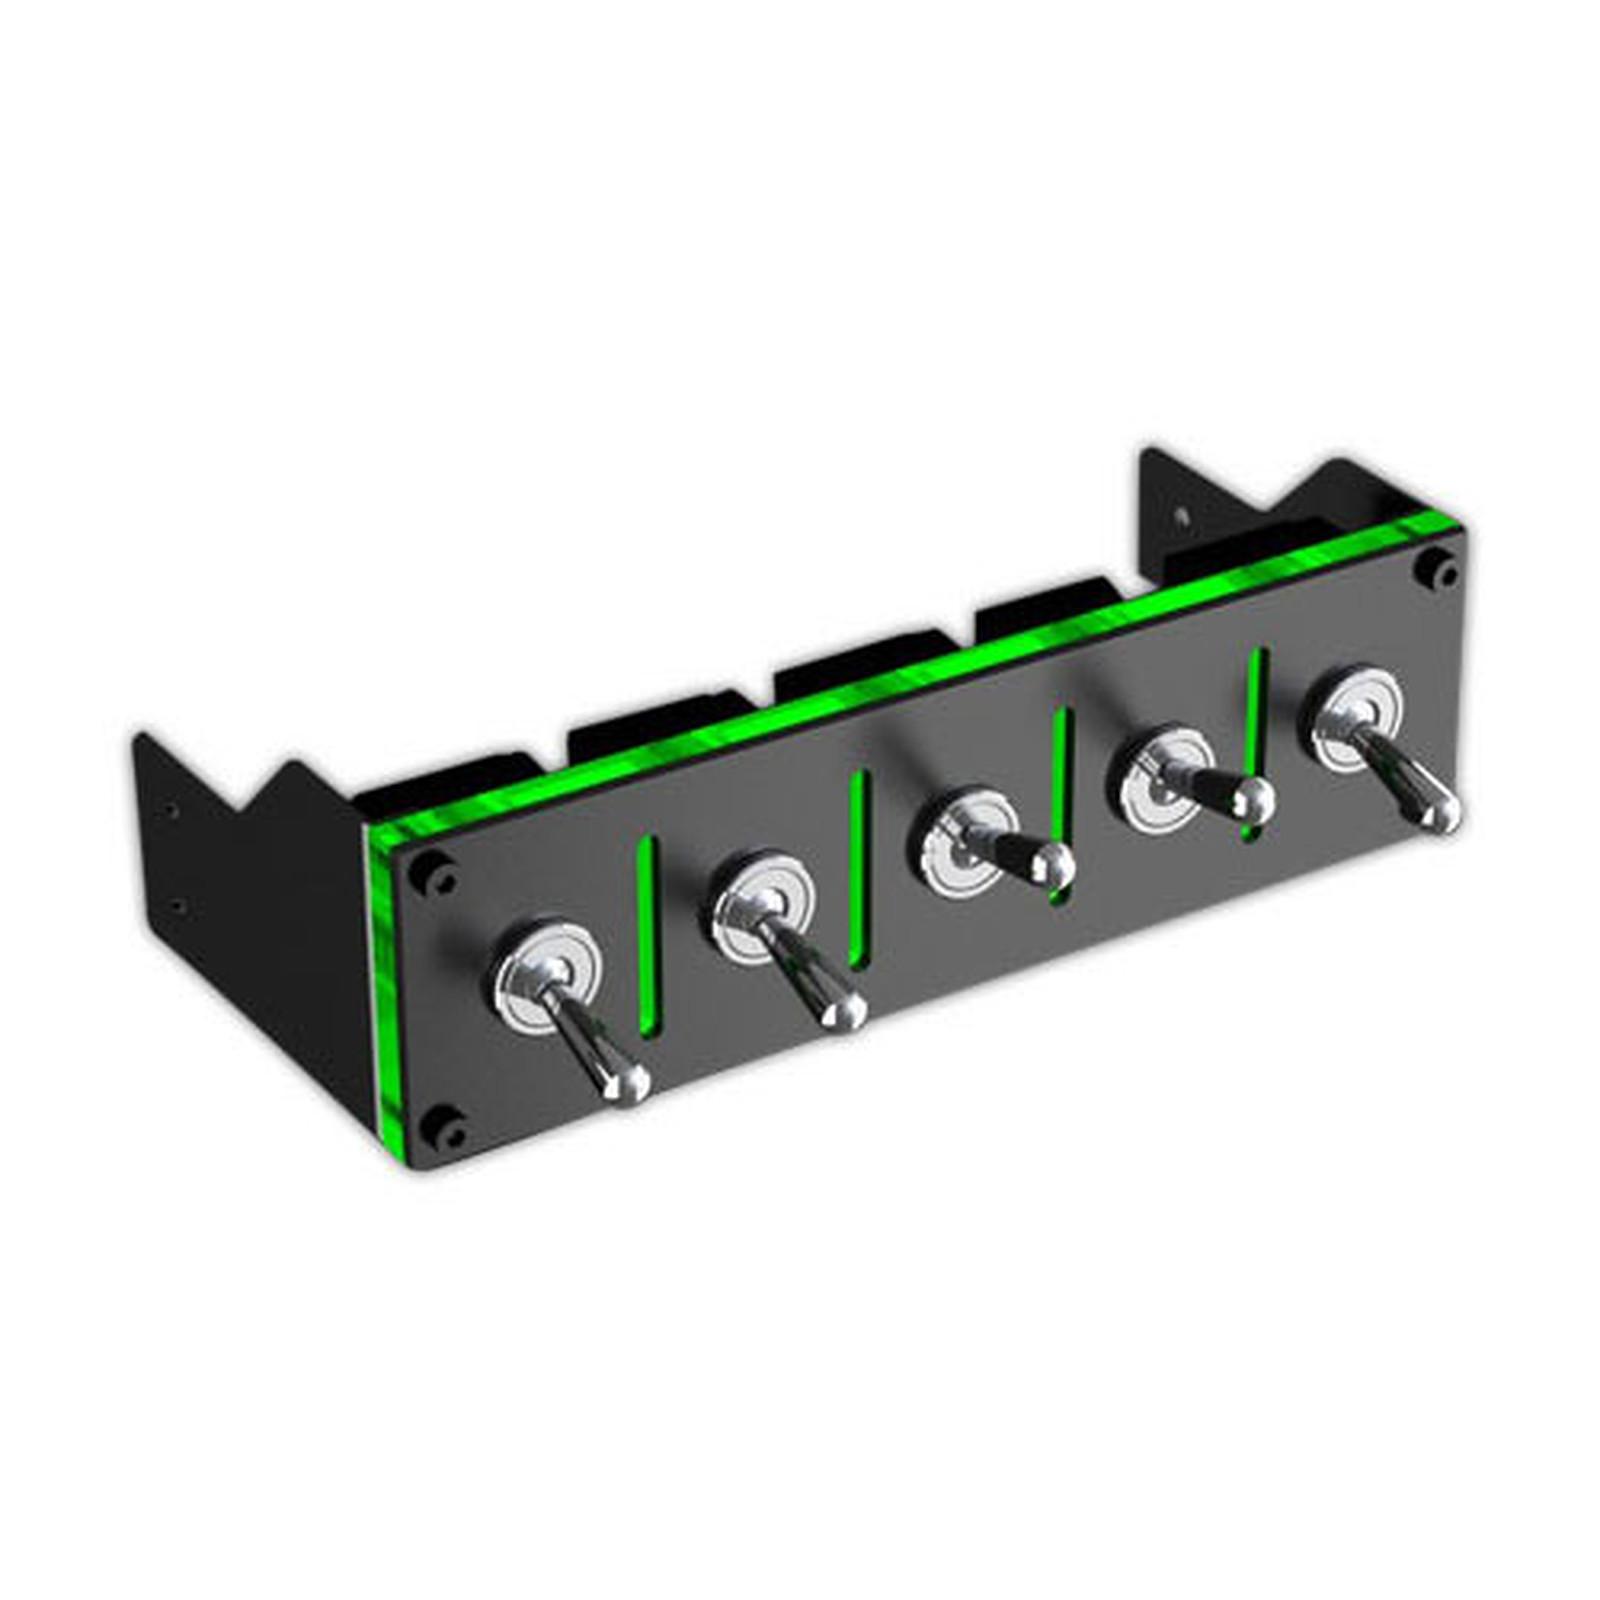 Lamptron Hummer Negro/Verde